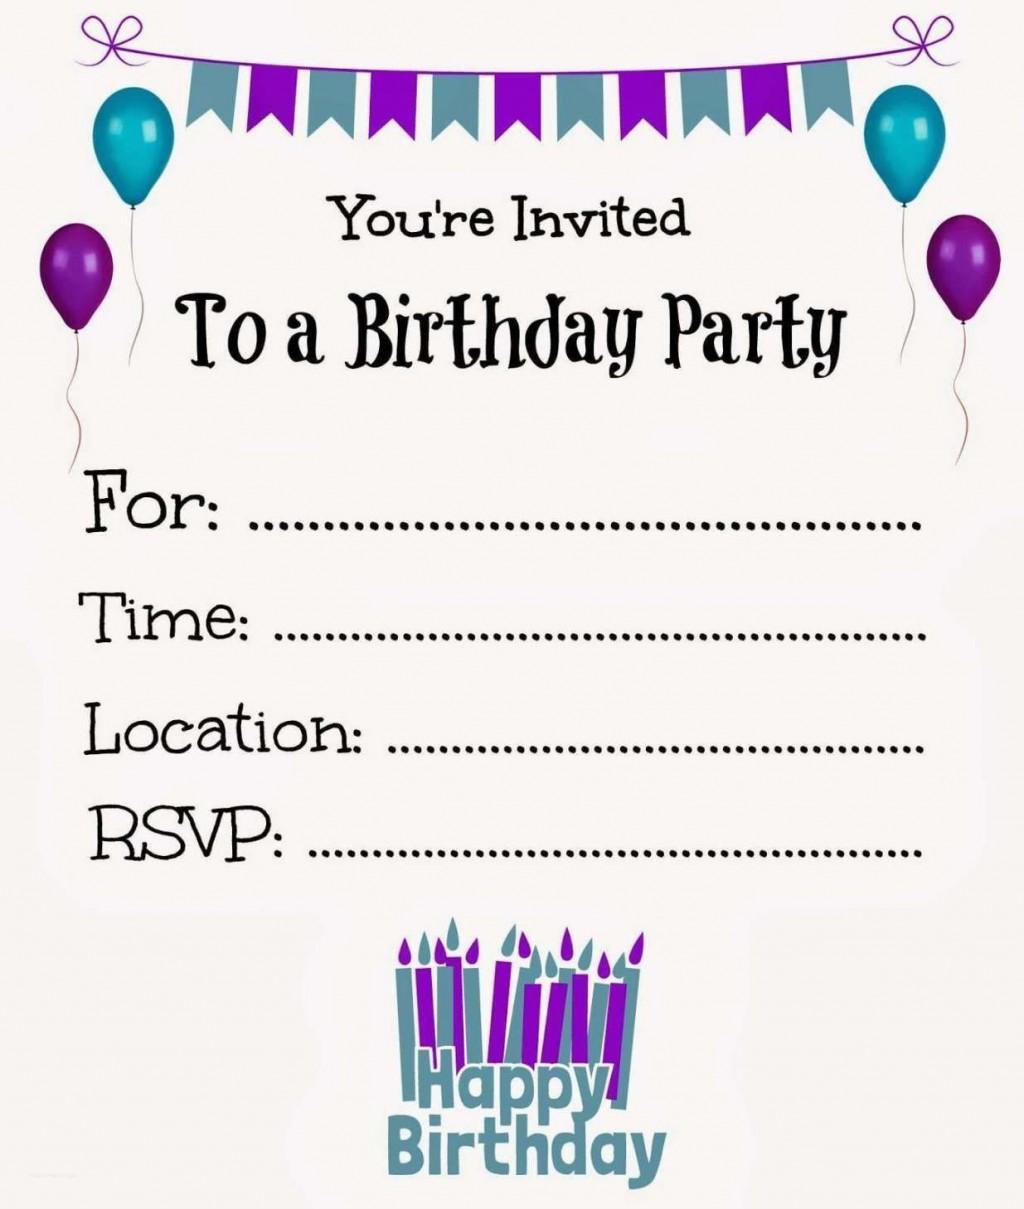 002 Impressive Free Online Invitation Template Printable Photo  Baby Shower WeddingLarge